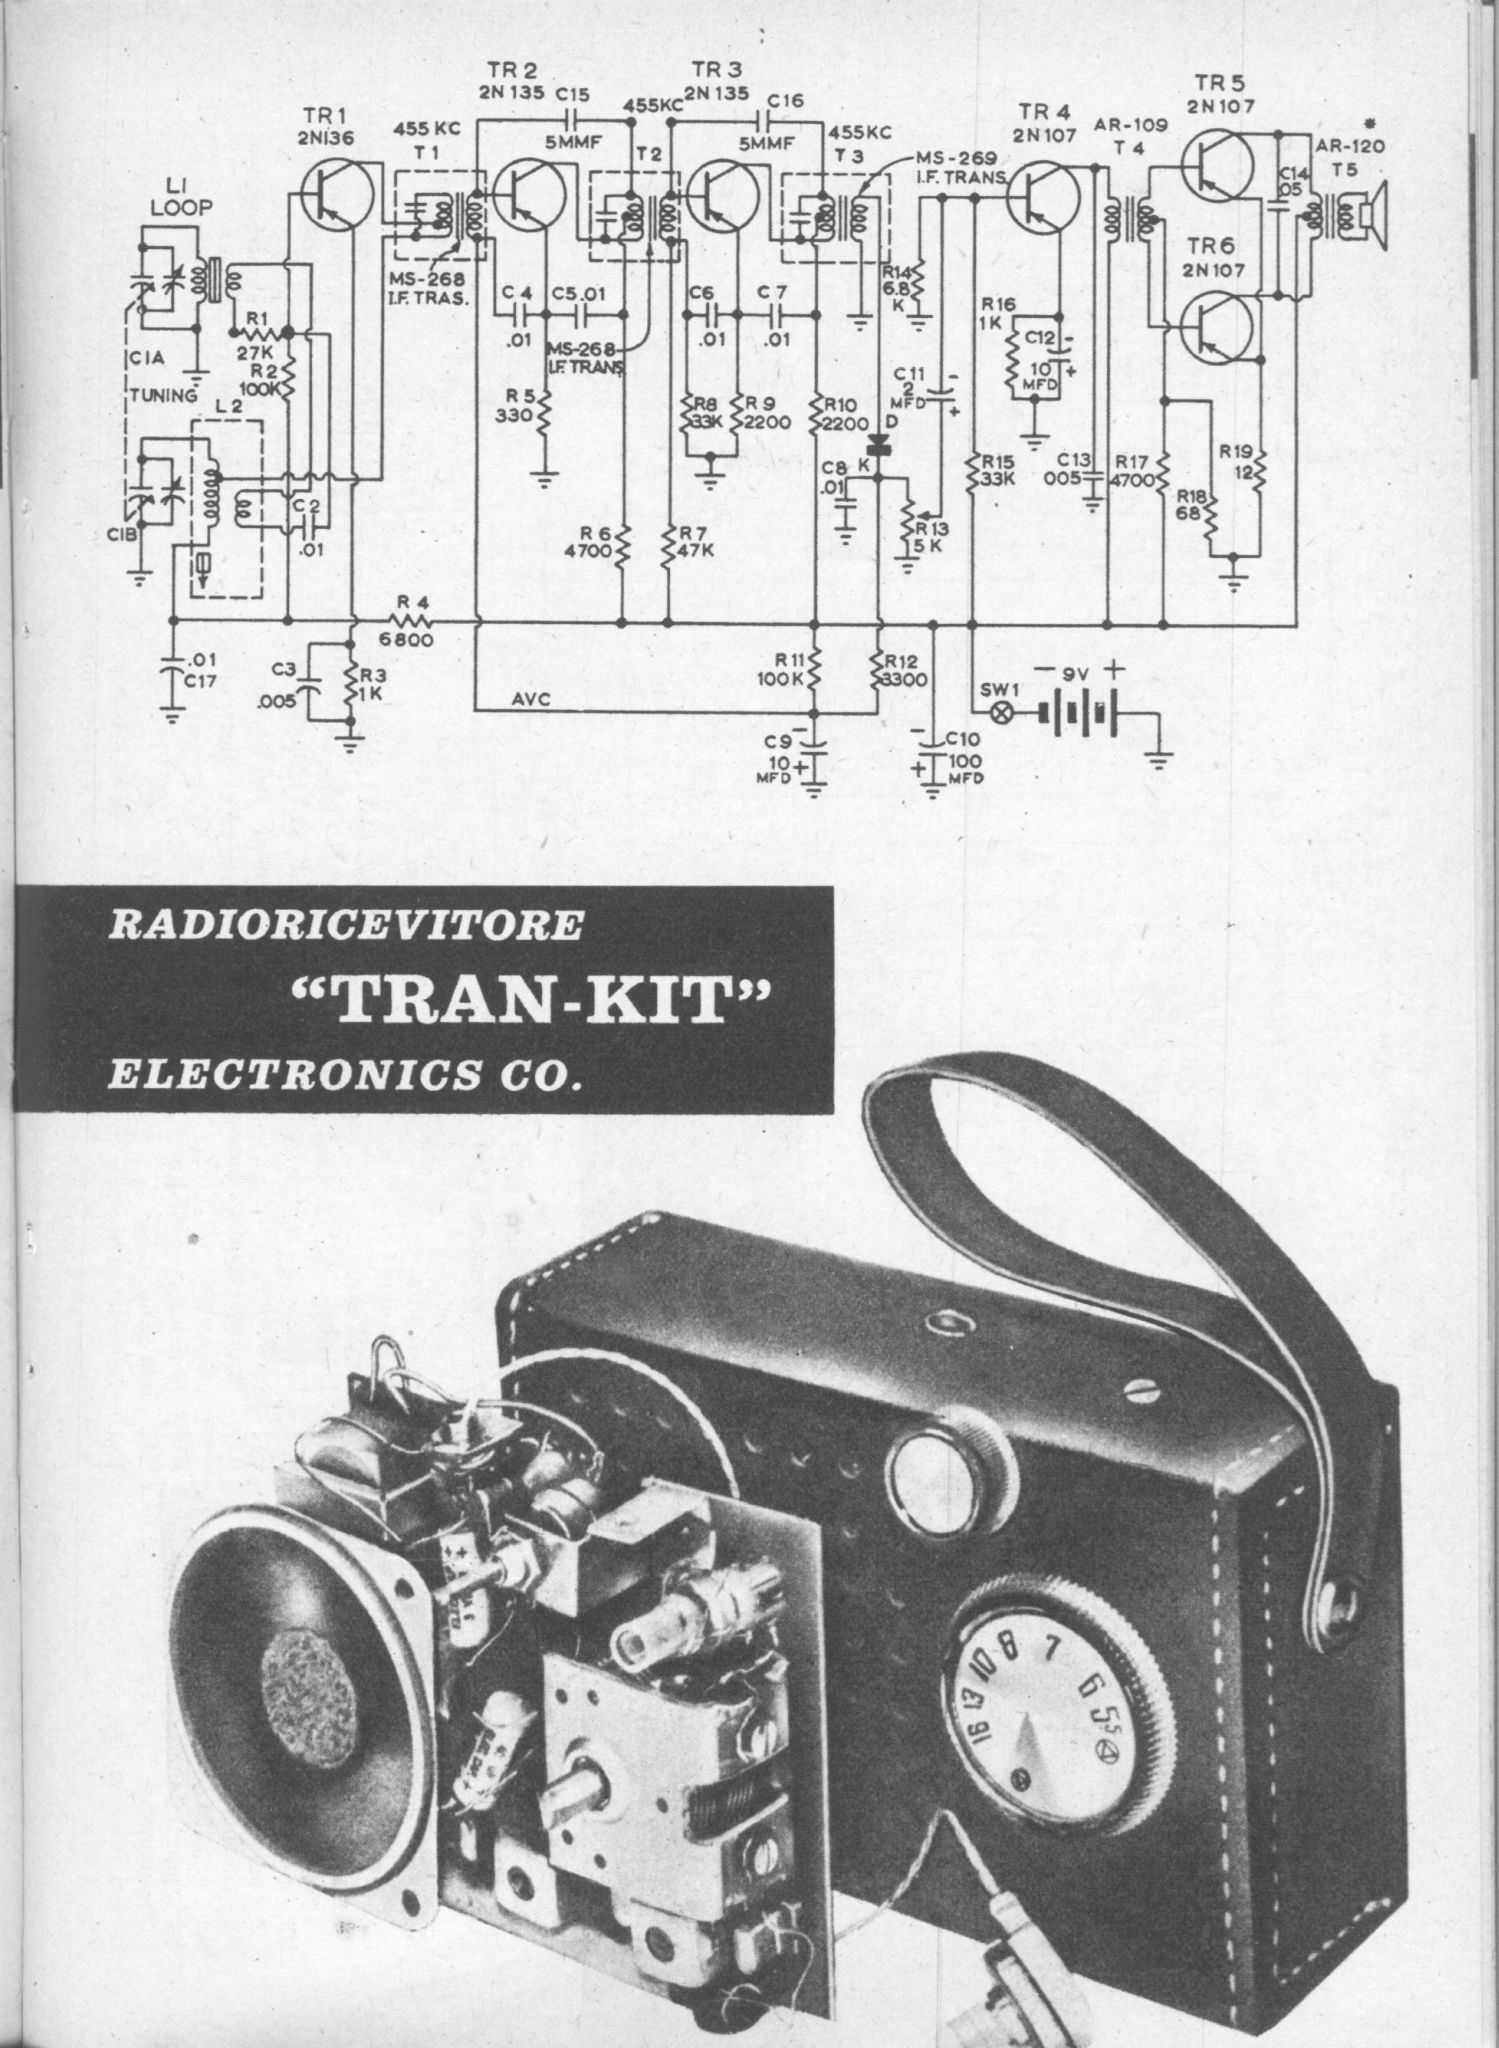 tran kit electronics co [Alyson hannigan hot scene] [amber benson alyson hannigan]